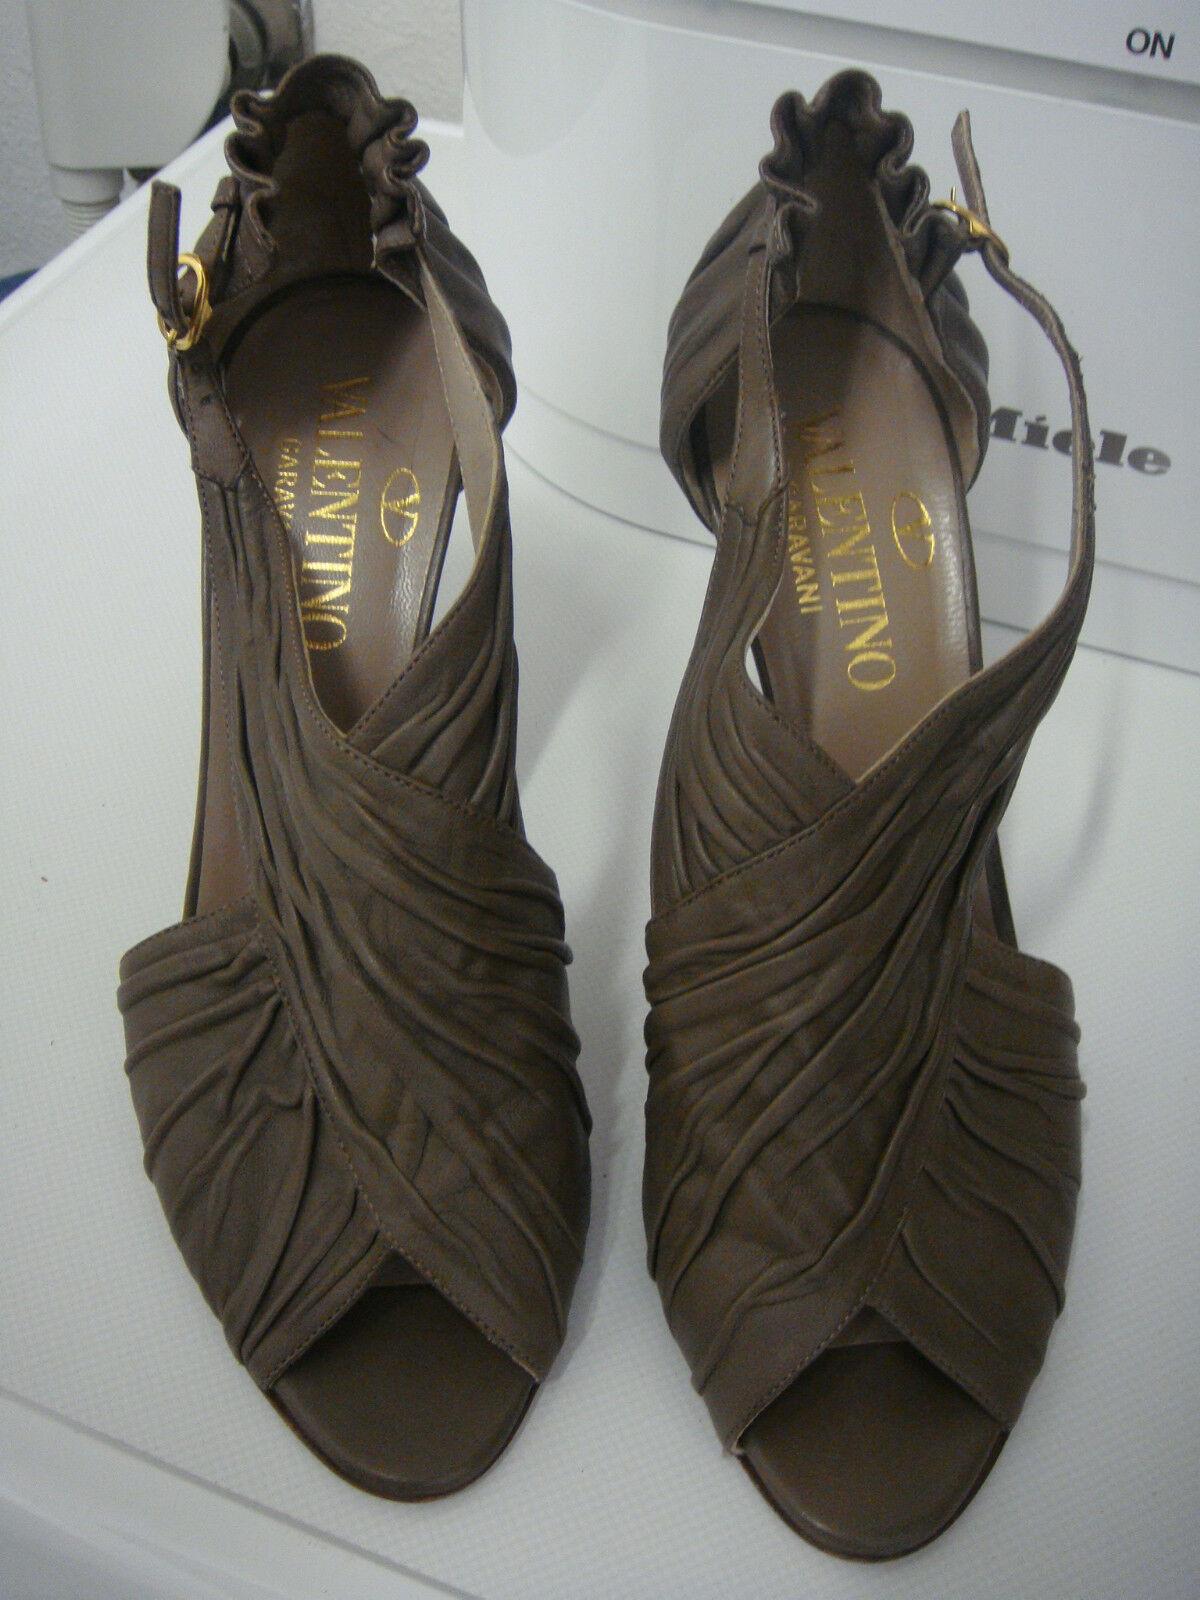 VALENTINO GARAVANI Schuhe Gr.40 Taupe